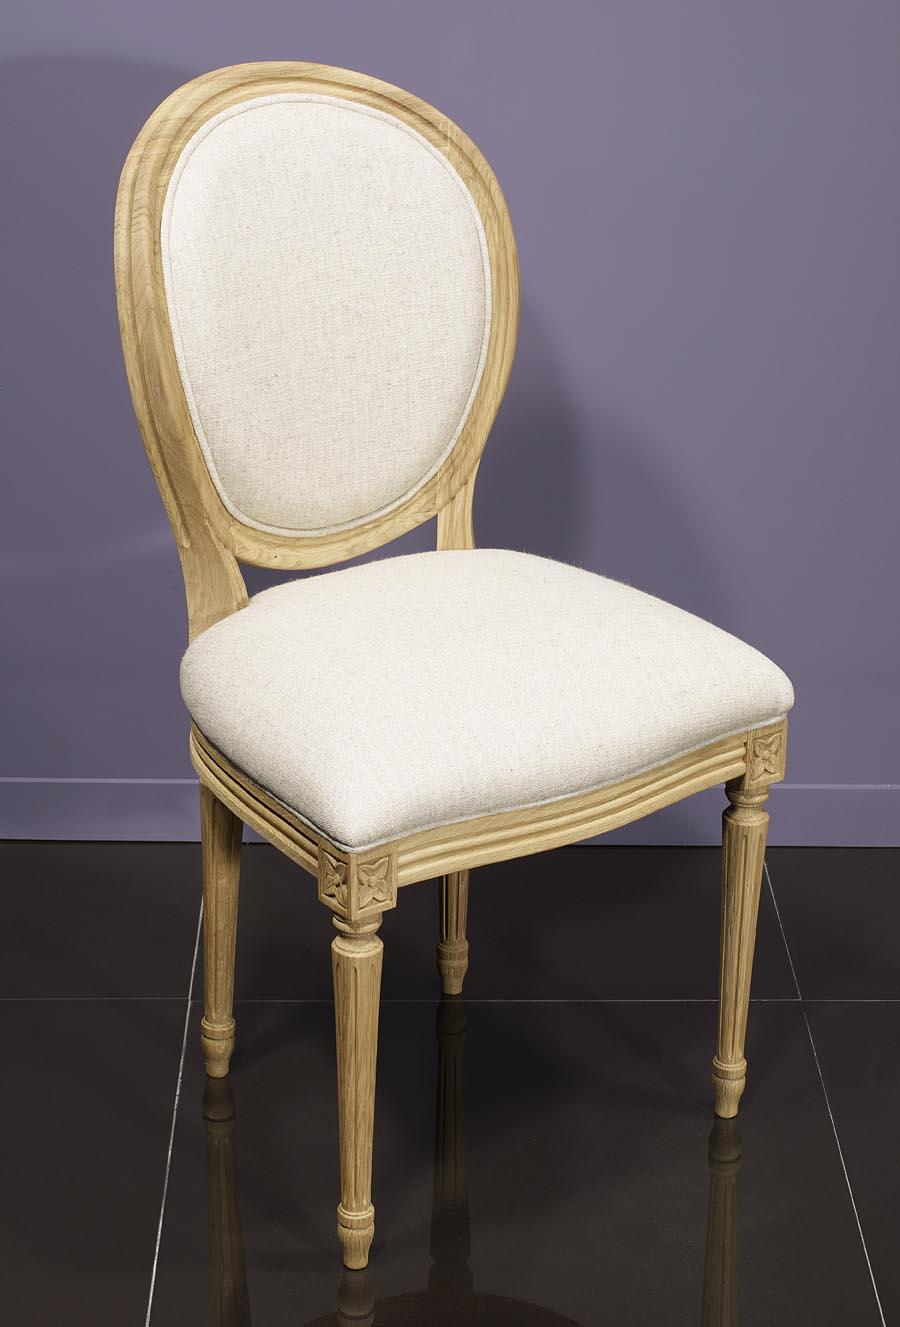 meuble en chne chaise simon ralise en chne massif de style louis xvi finition chne bross tissu. Black Bedroom Furniture Sets. Home Design Ideas